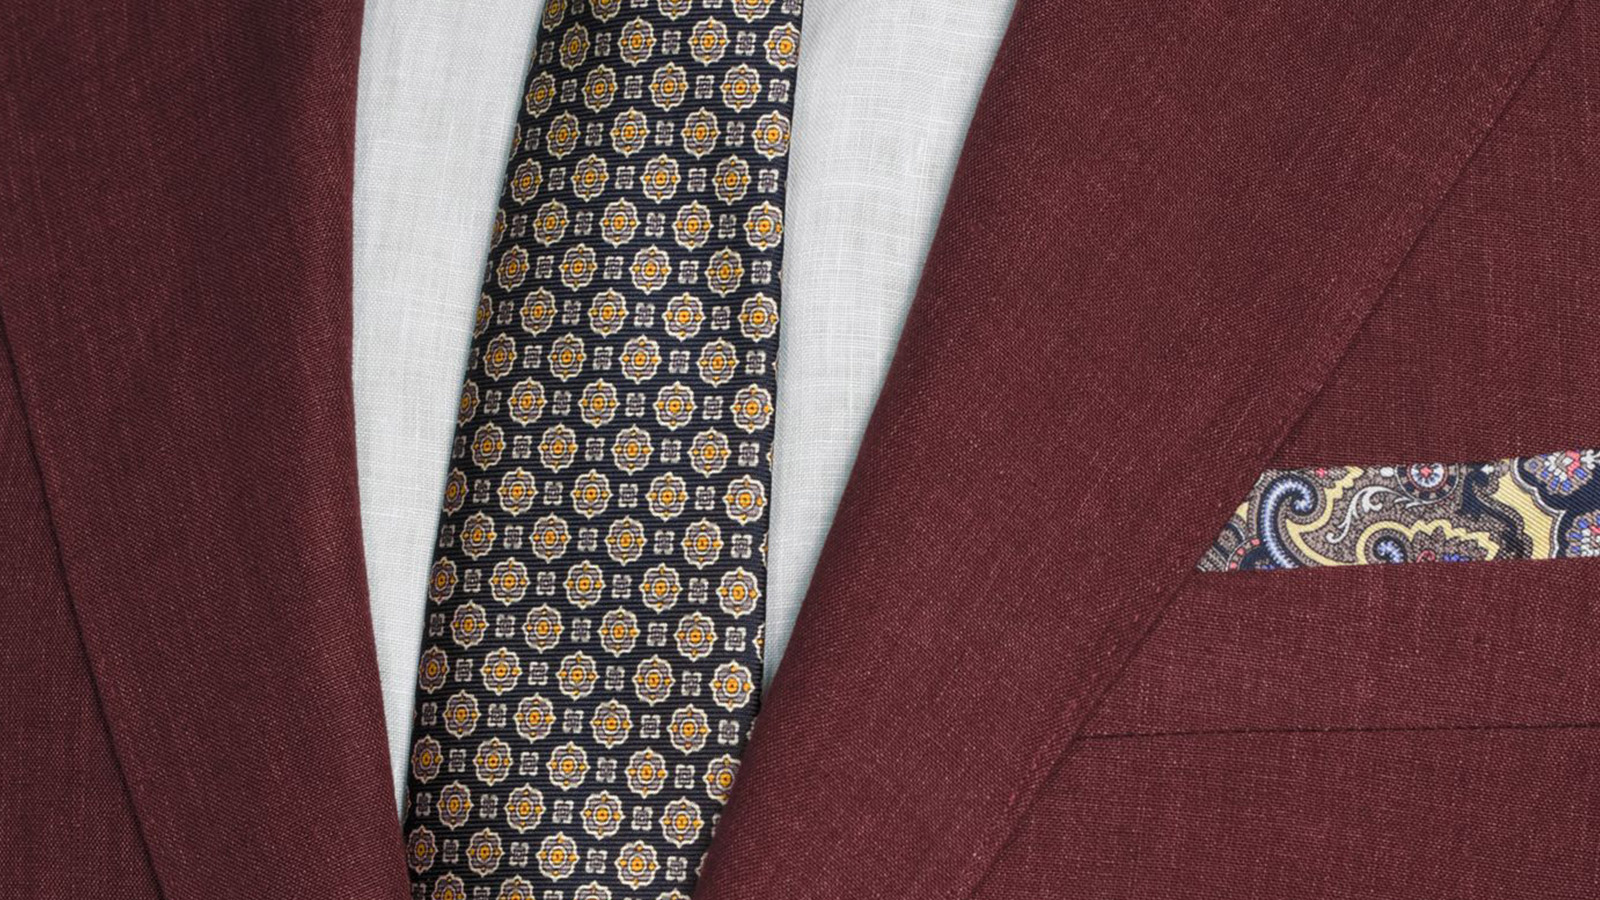 Intense Ruby Red Linen Suit - slider image 1